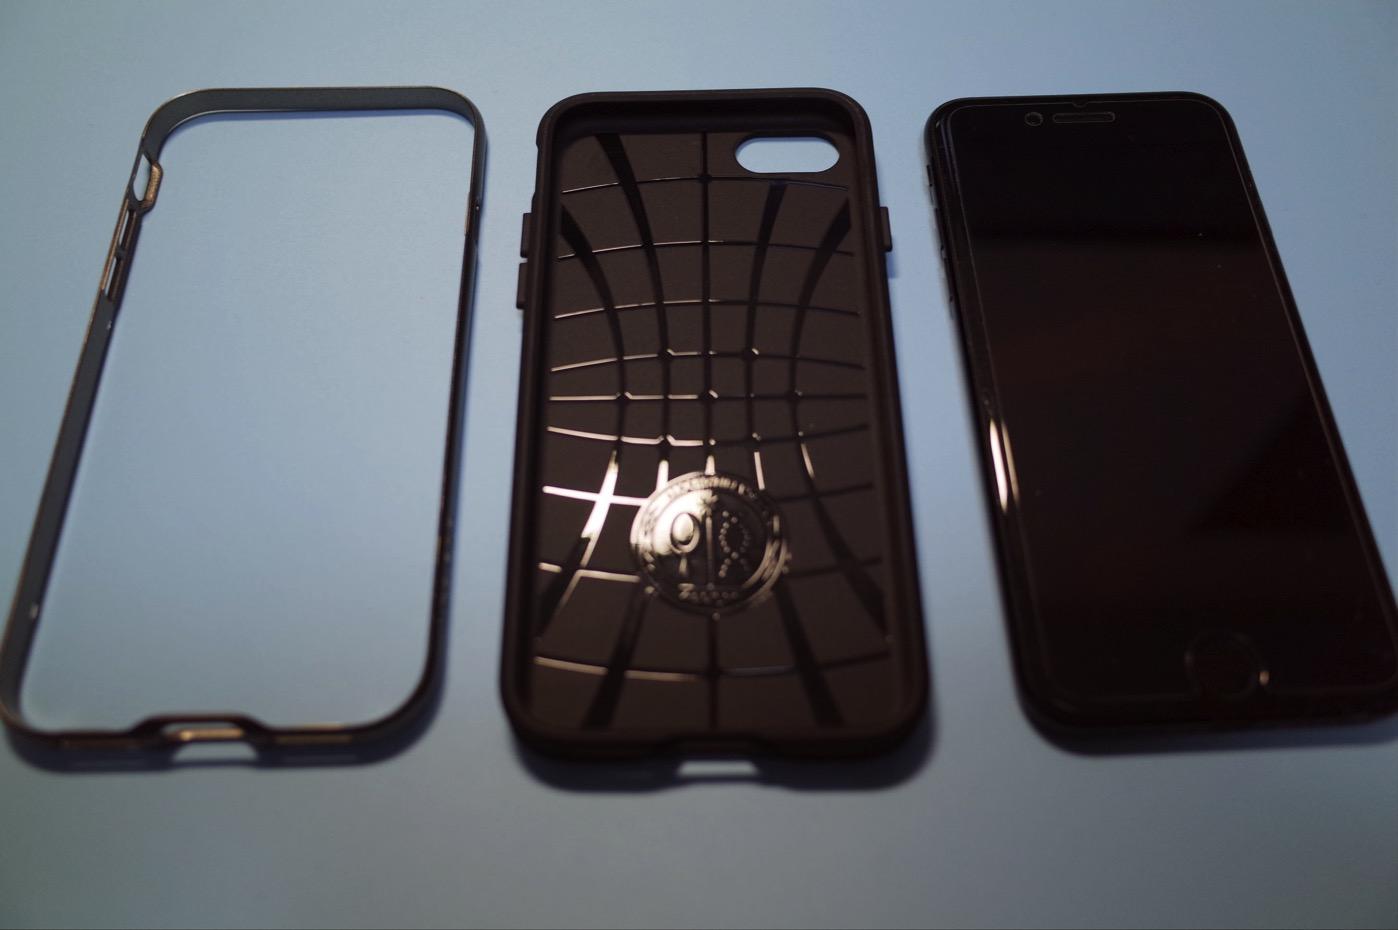 iPhoneケース「ネオ・ハイブリッド米軍MIL規格取得 二重構造バンパー」-7